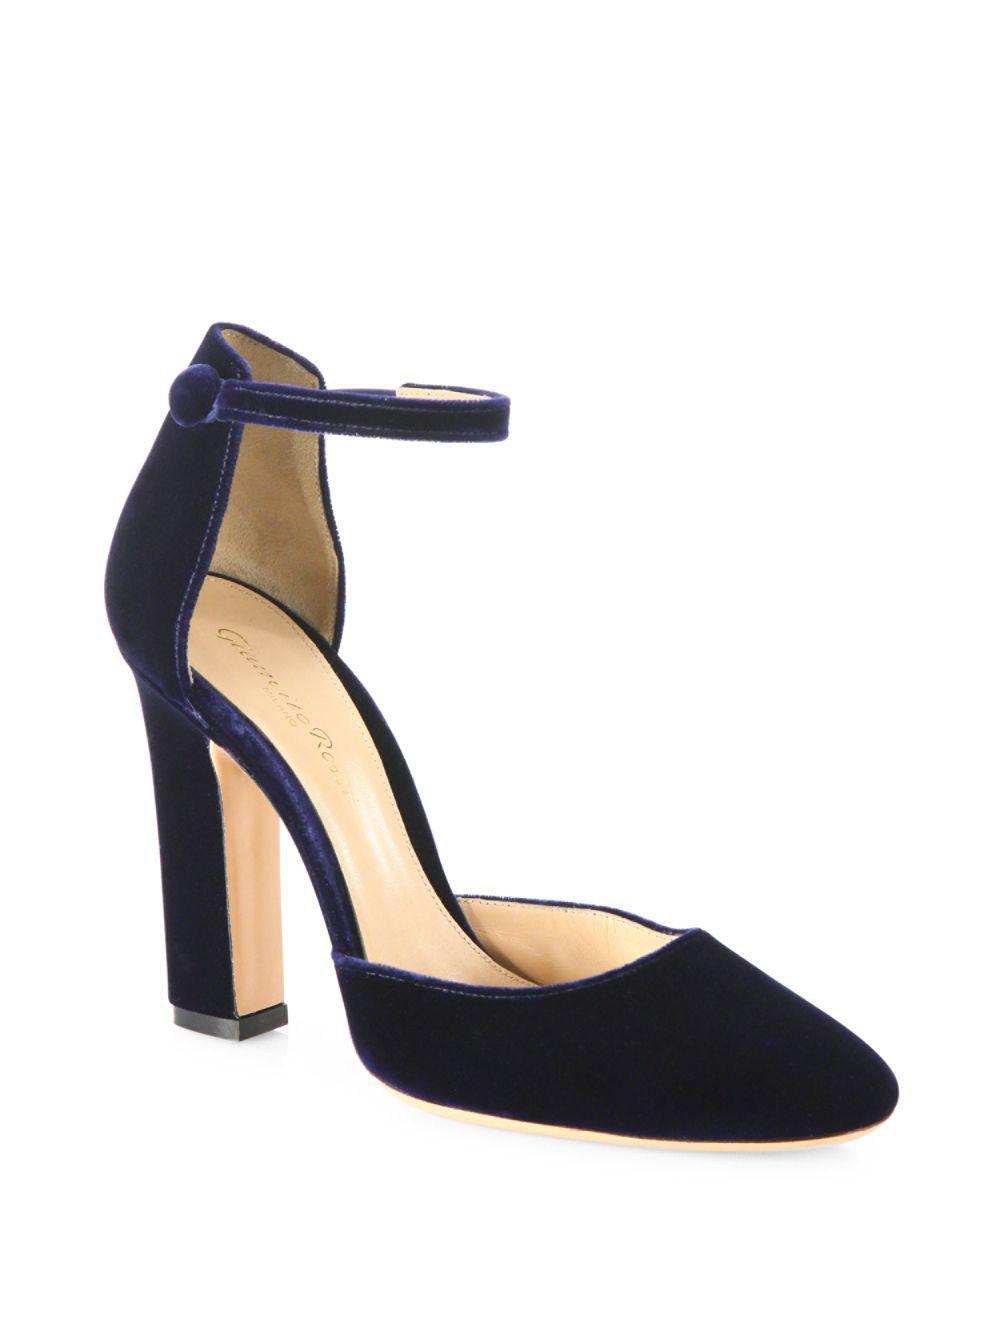 306070a1a79d Gianvito Rossi. Women s Blue Velvet Ankle-strap Block-heel Court Shoes